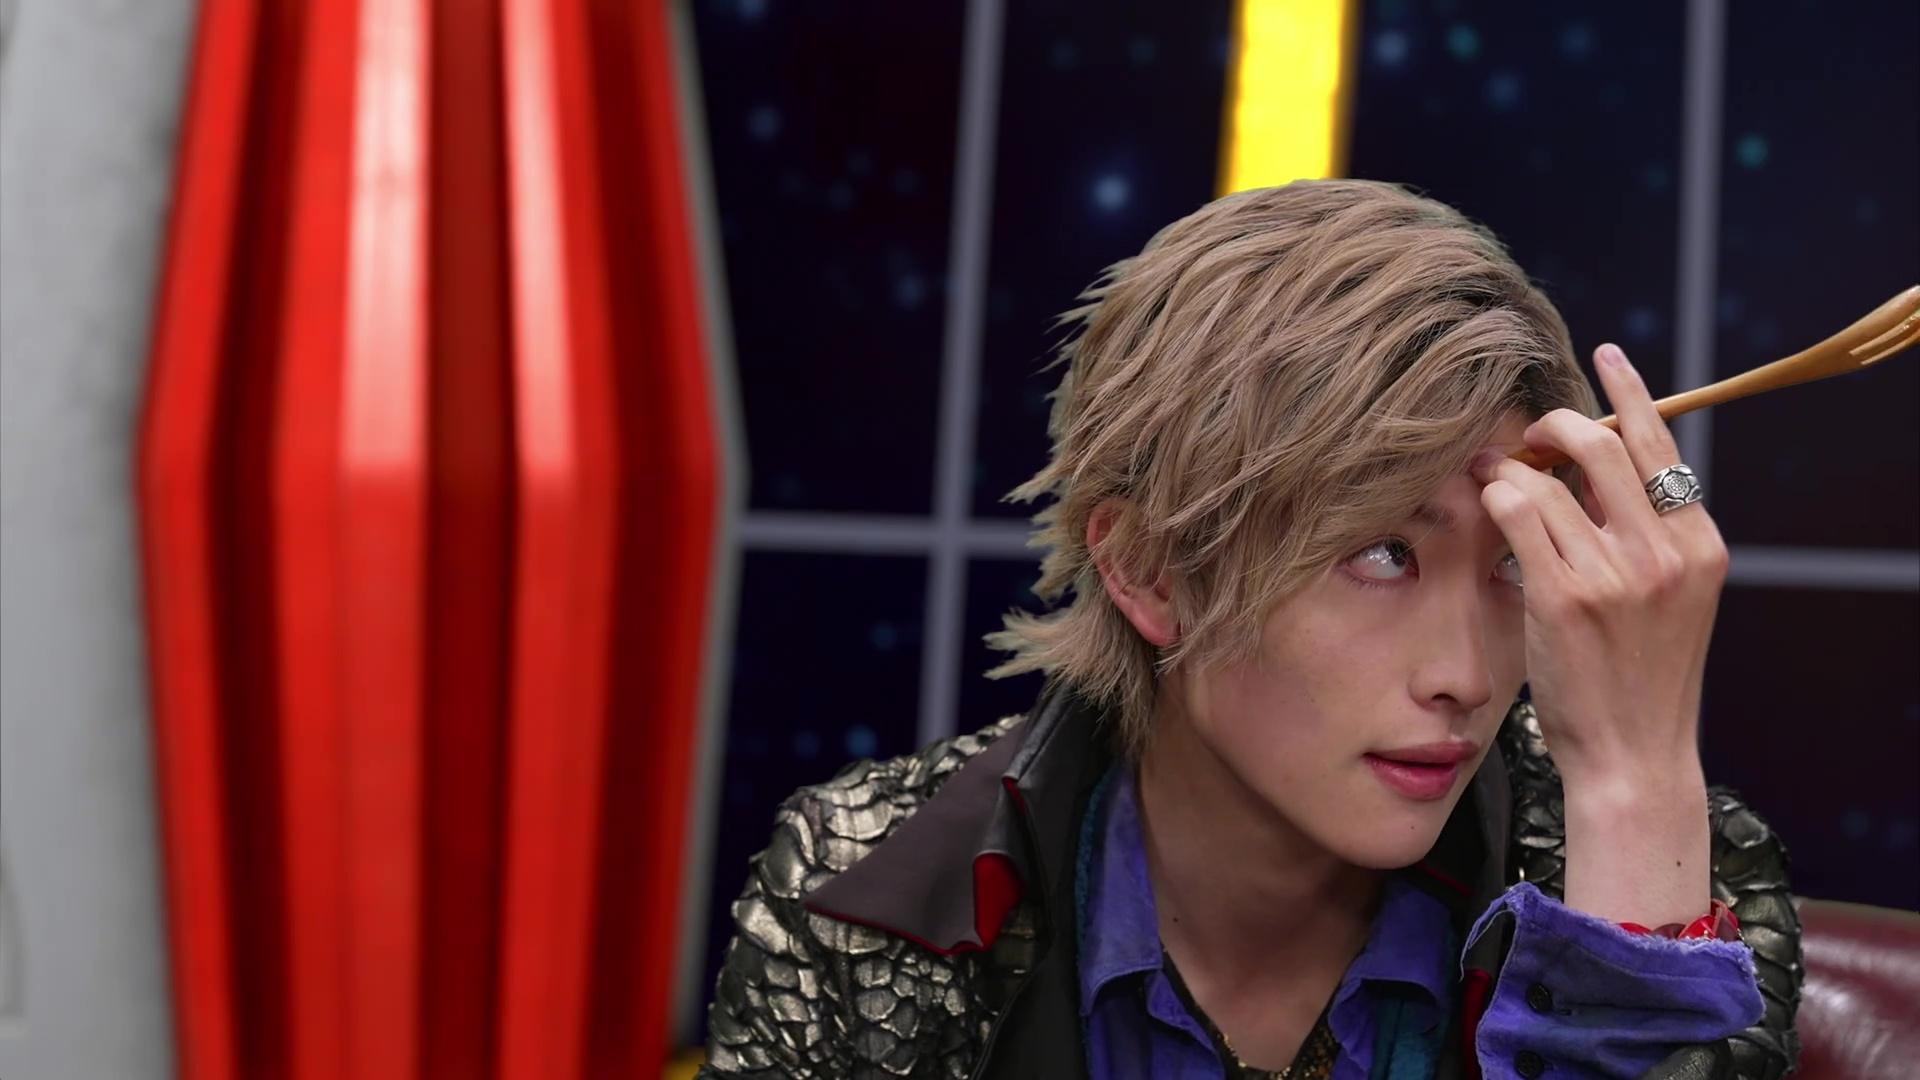 Kikai Sentai Zenkaiger Episode 19 Recap